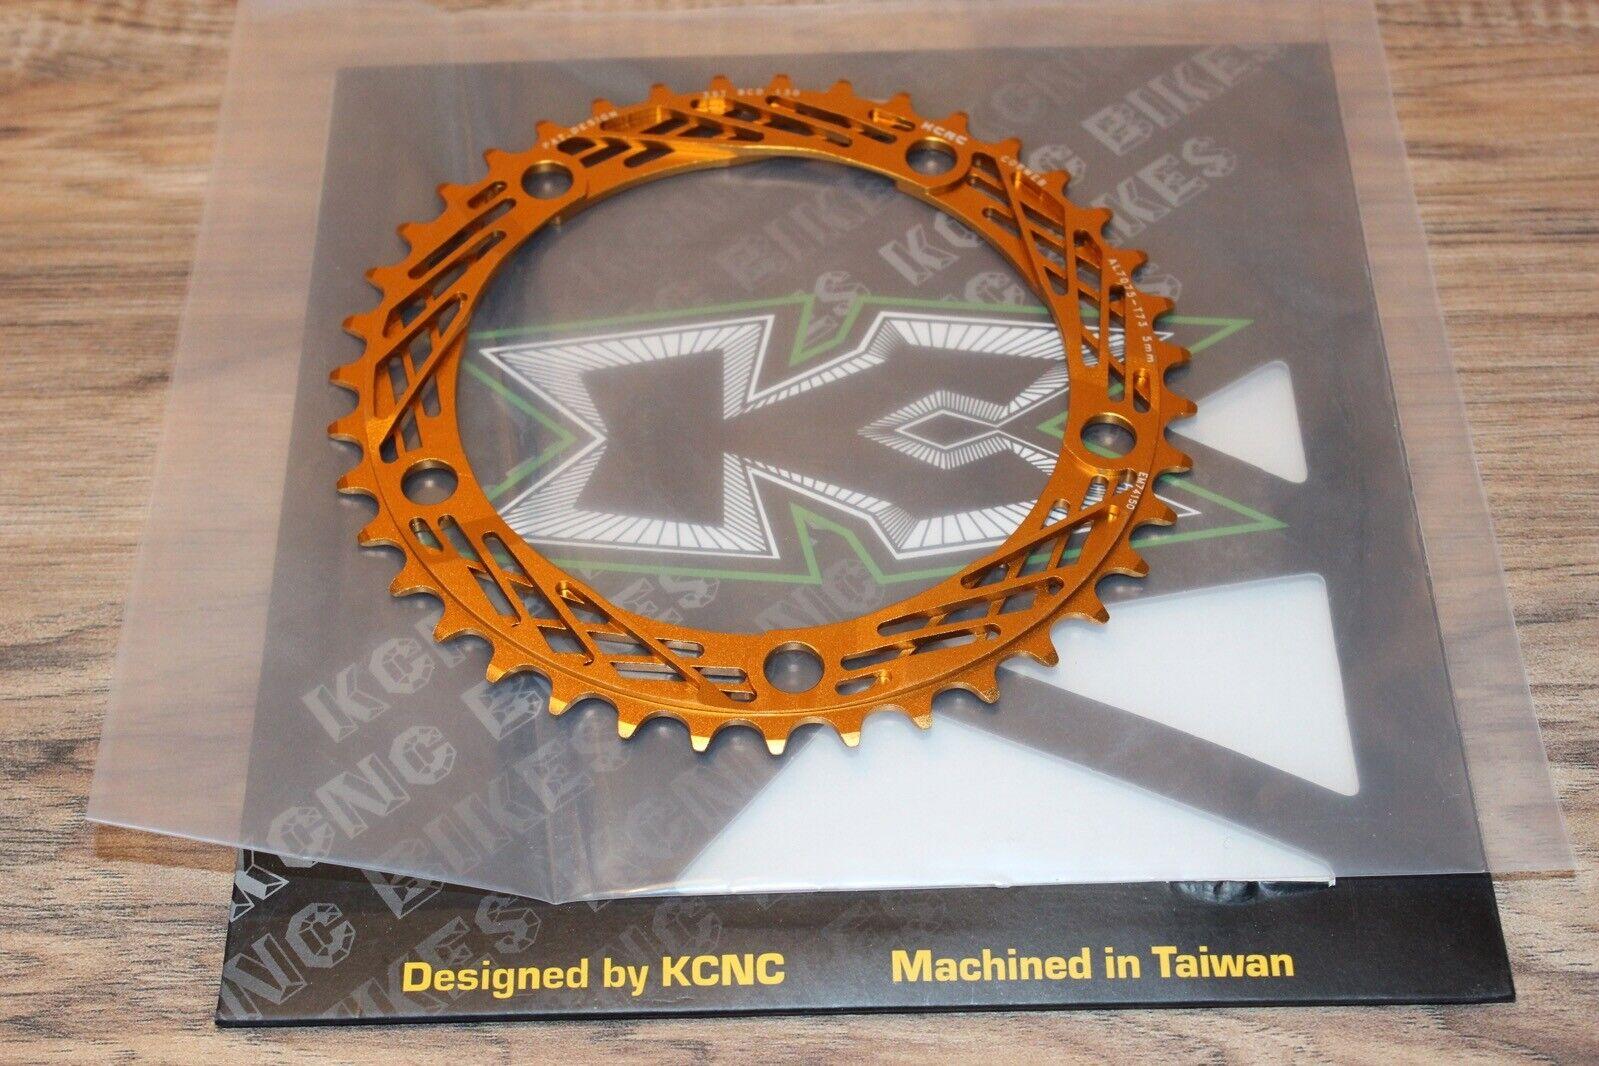 KCNC Cobweb CNC Road Bike Chainring 5 bolt 130 BCD 39T Gold Anodized